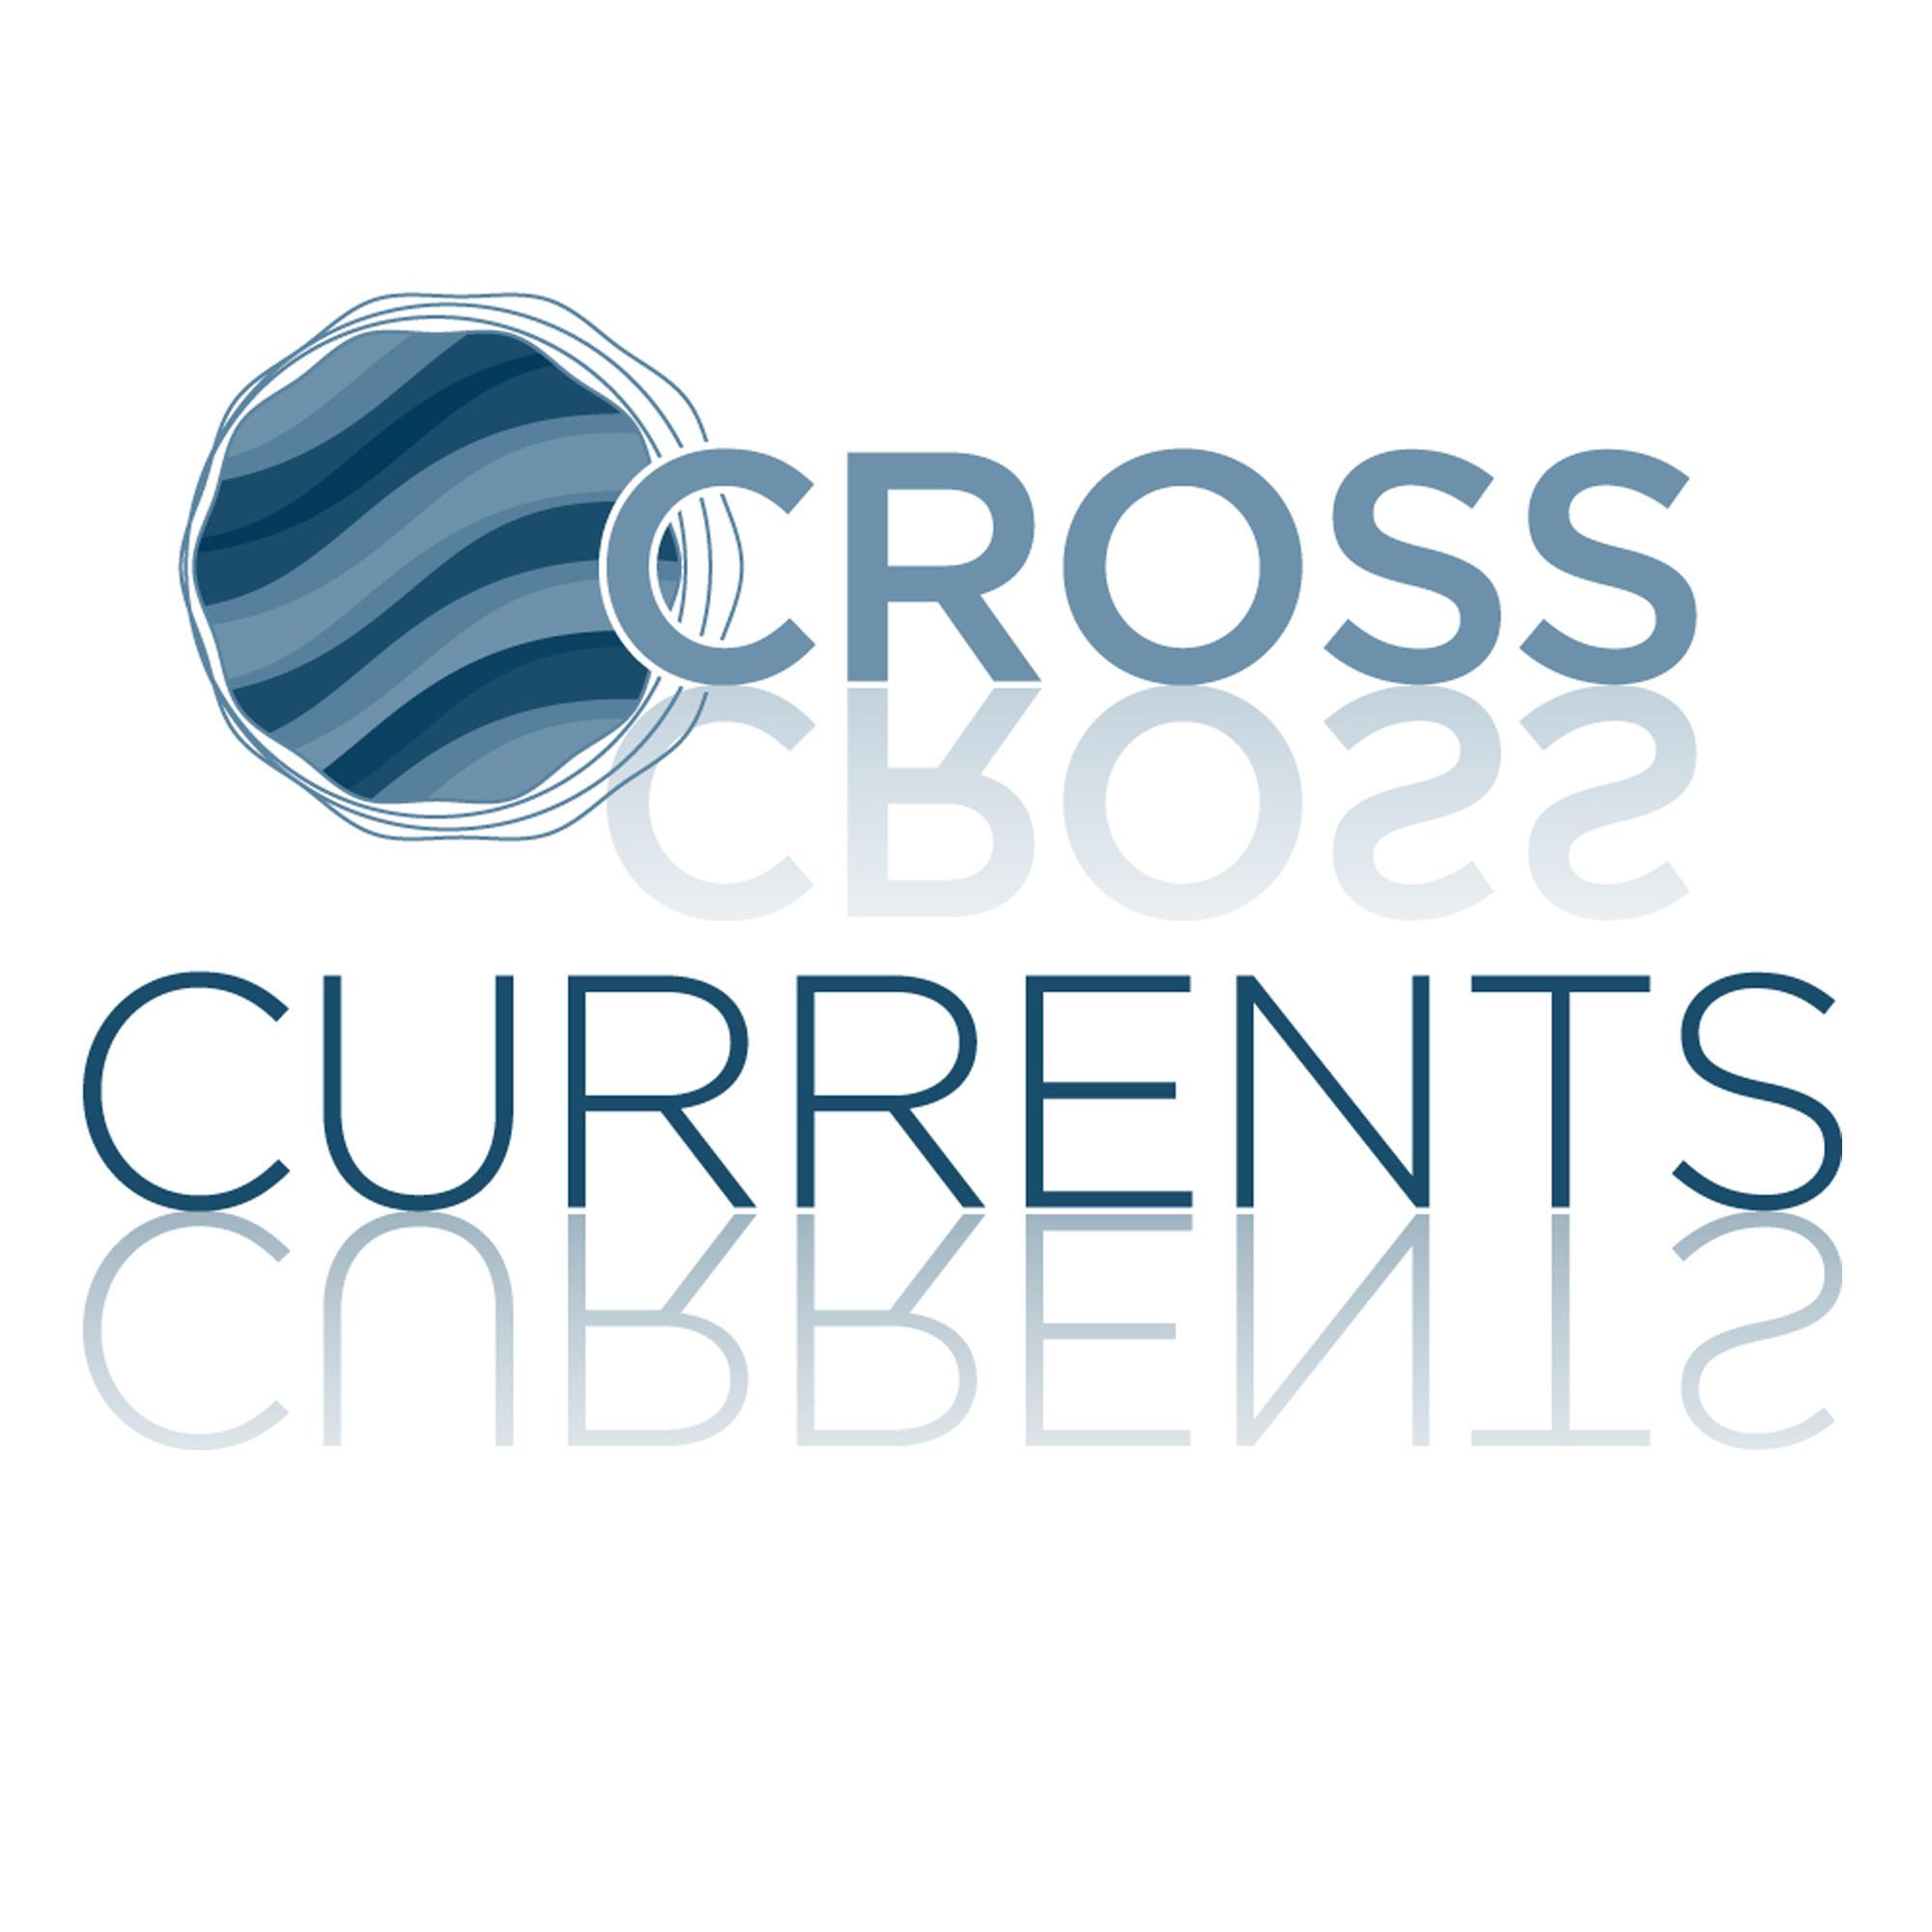 Cross Currents.